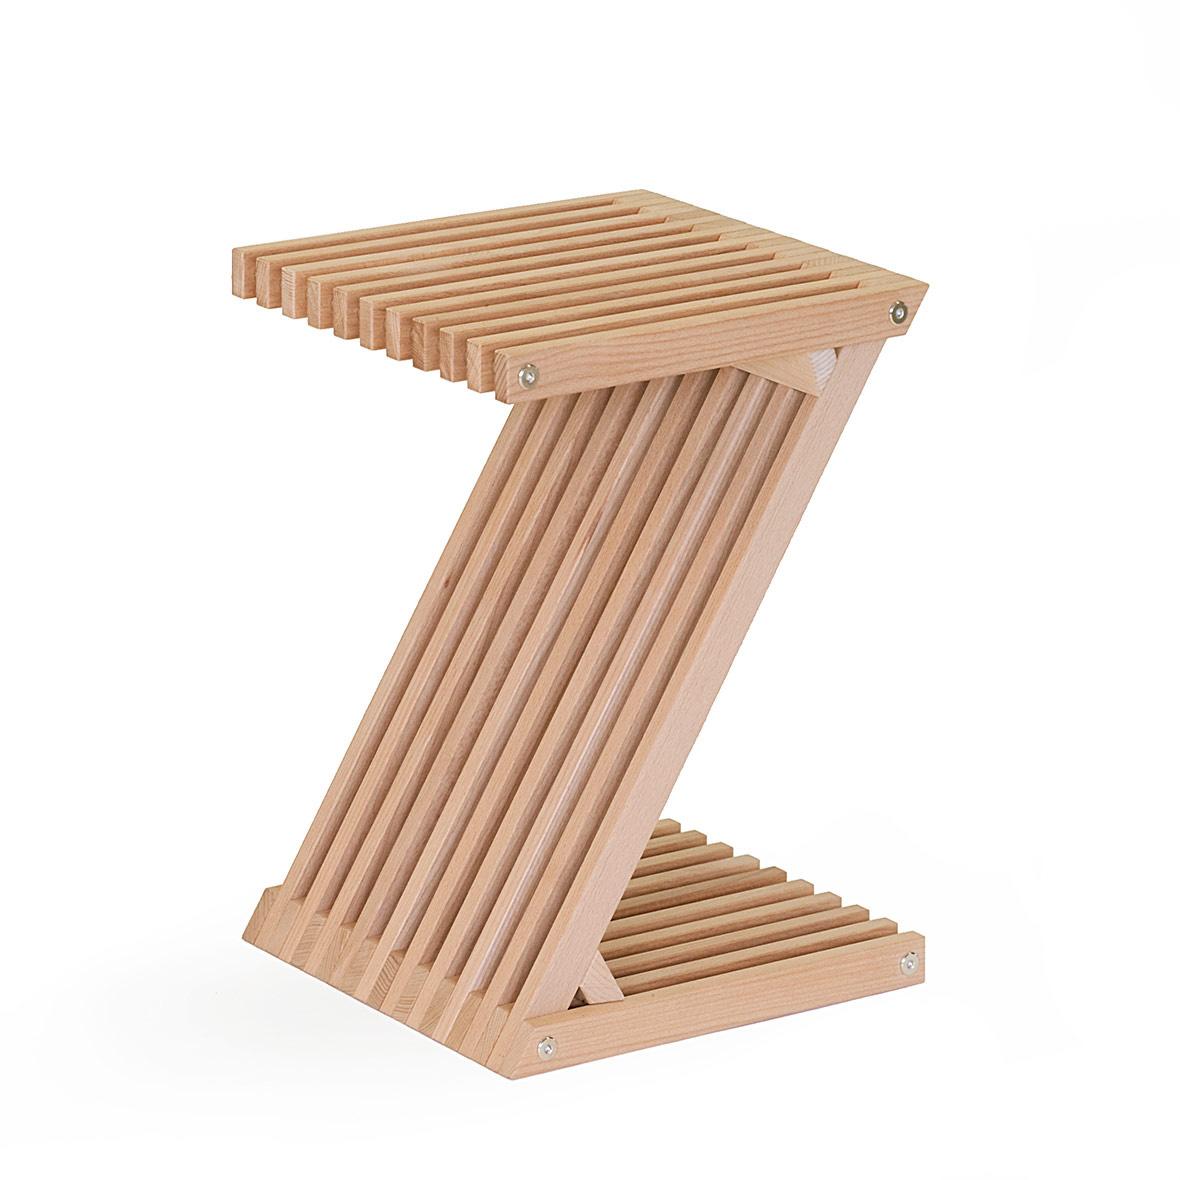 holzmöbel z hocker schweizer massivholz